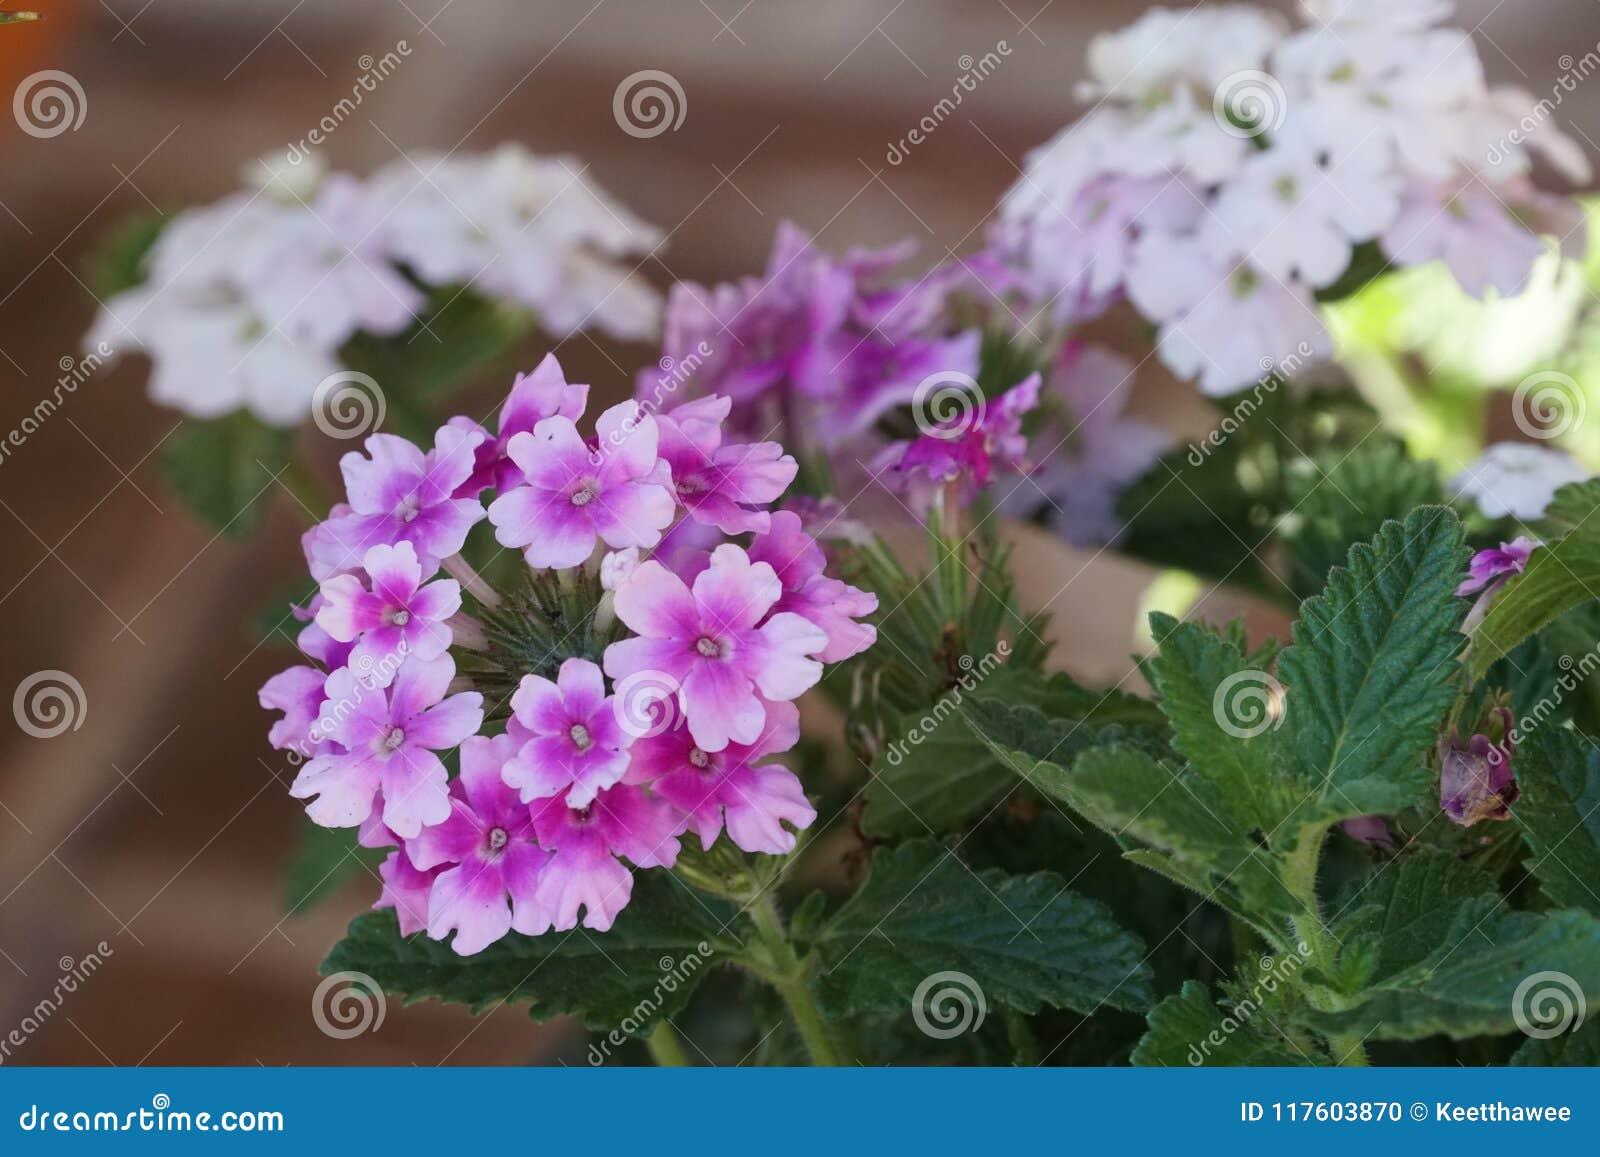 Verbena endurascape purple flowers bloom all season stock photo verbena endurascape purple flowers bloom all season izmirmasajfo